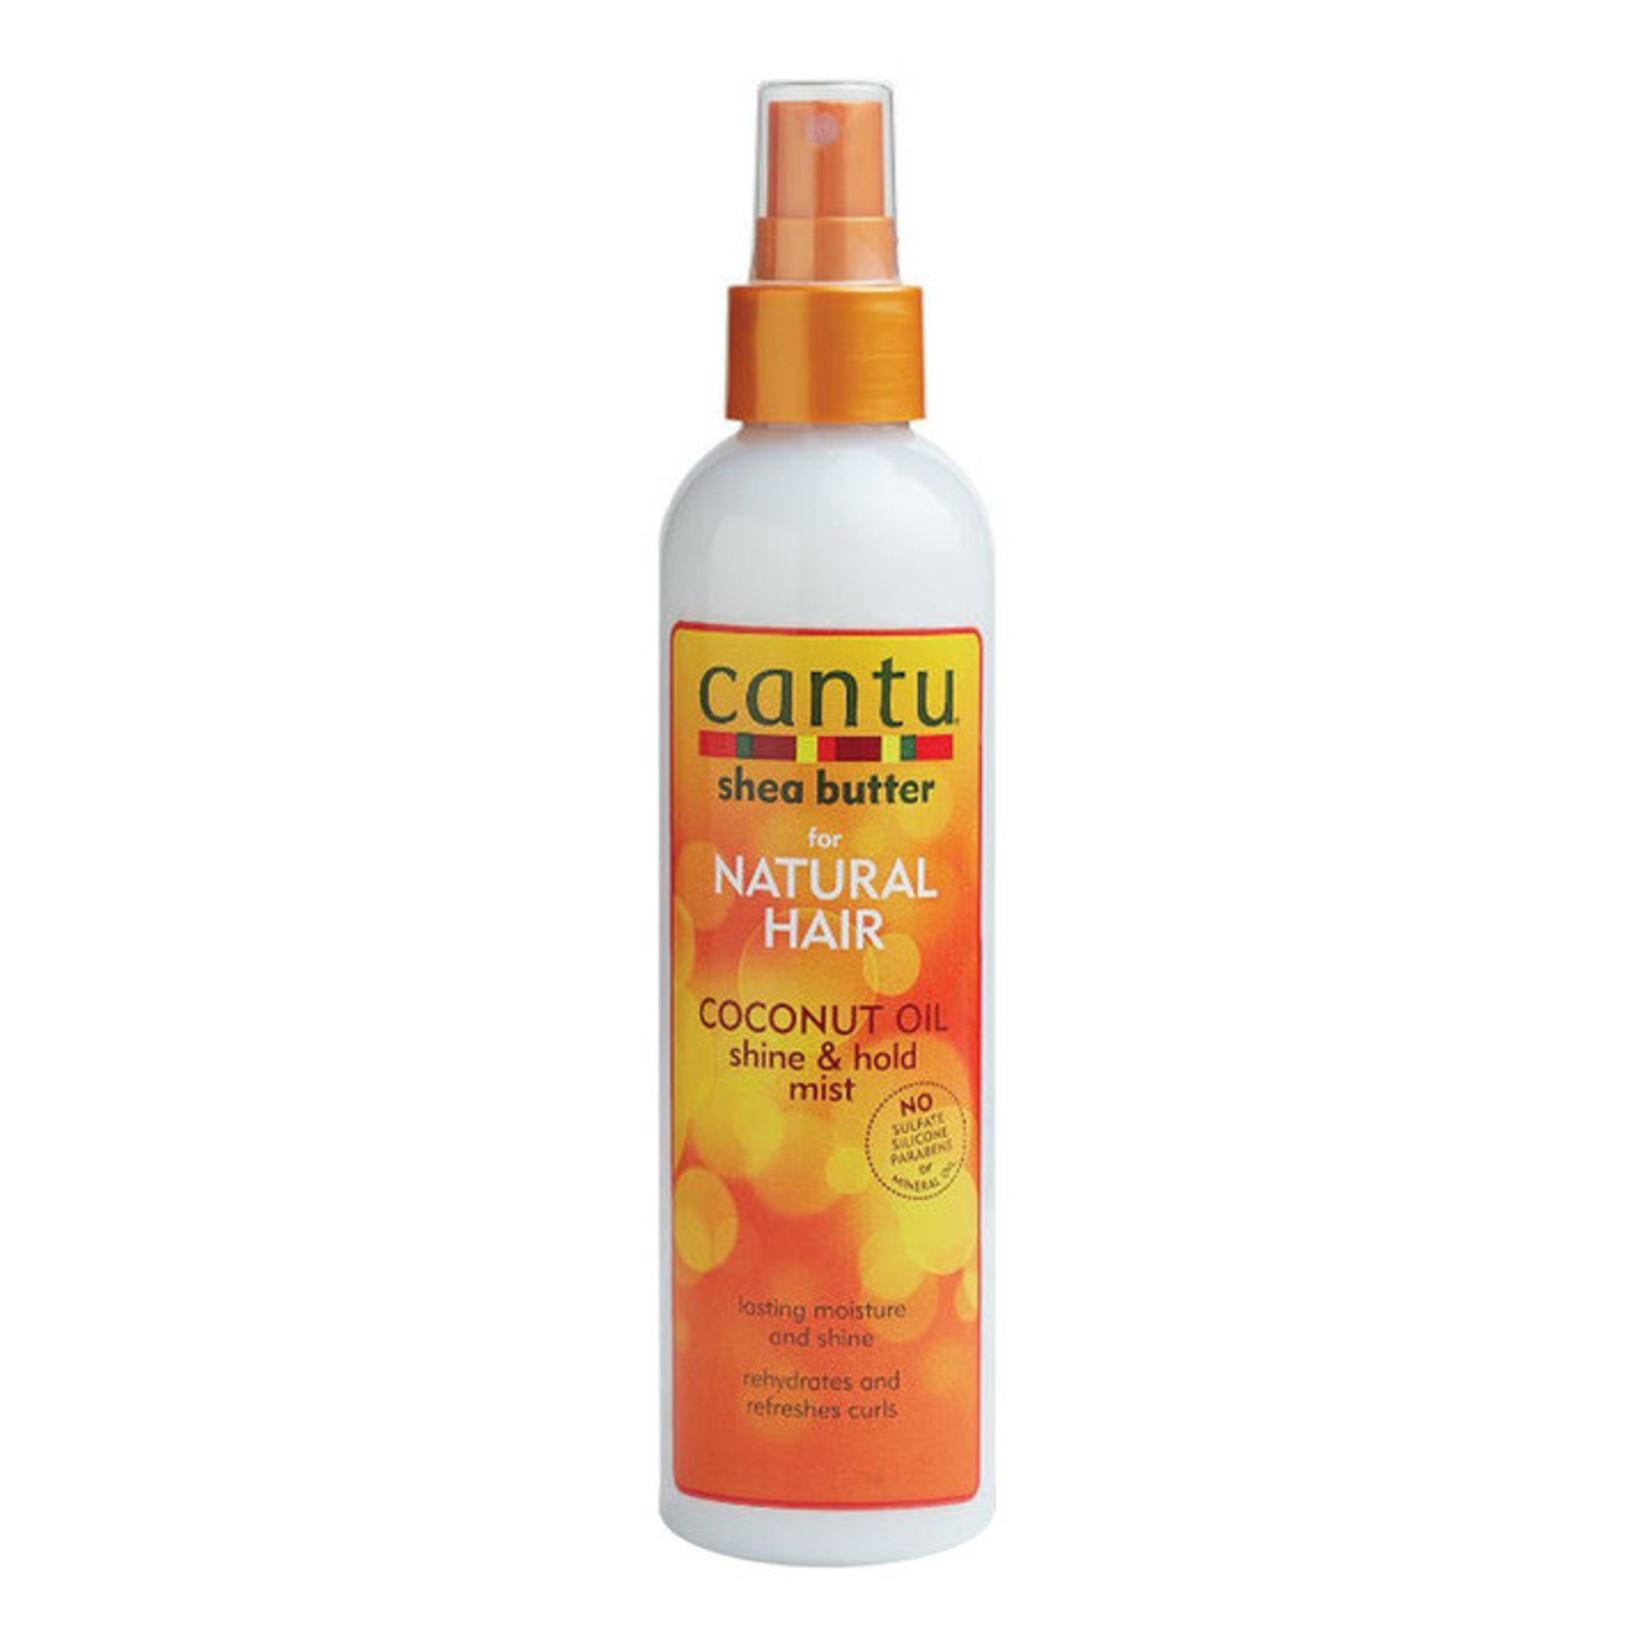 CANTU CANTU NATURAL HAIR COCONUT MILK SHINE&HOLD MIST [8.4OZ]